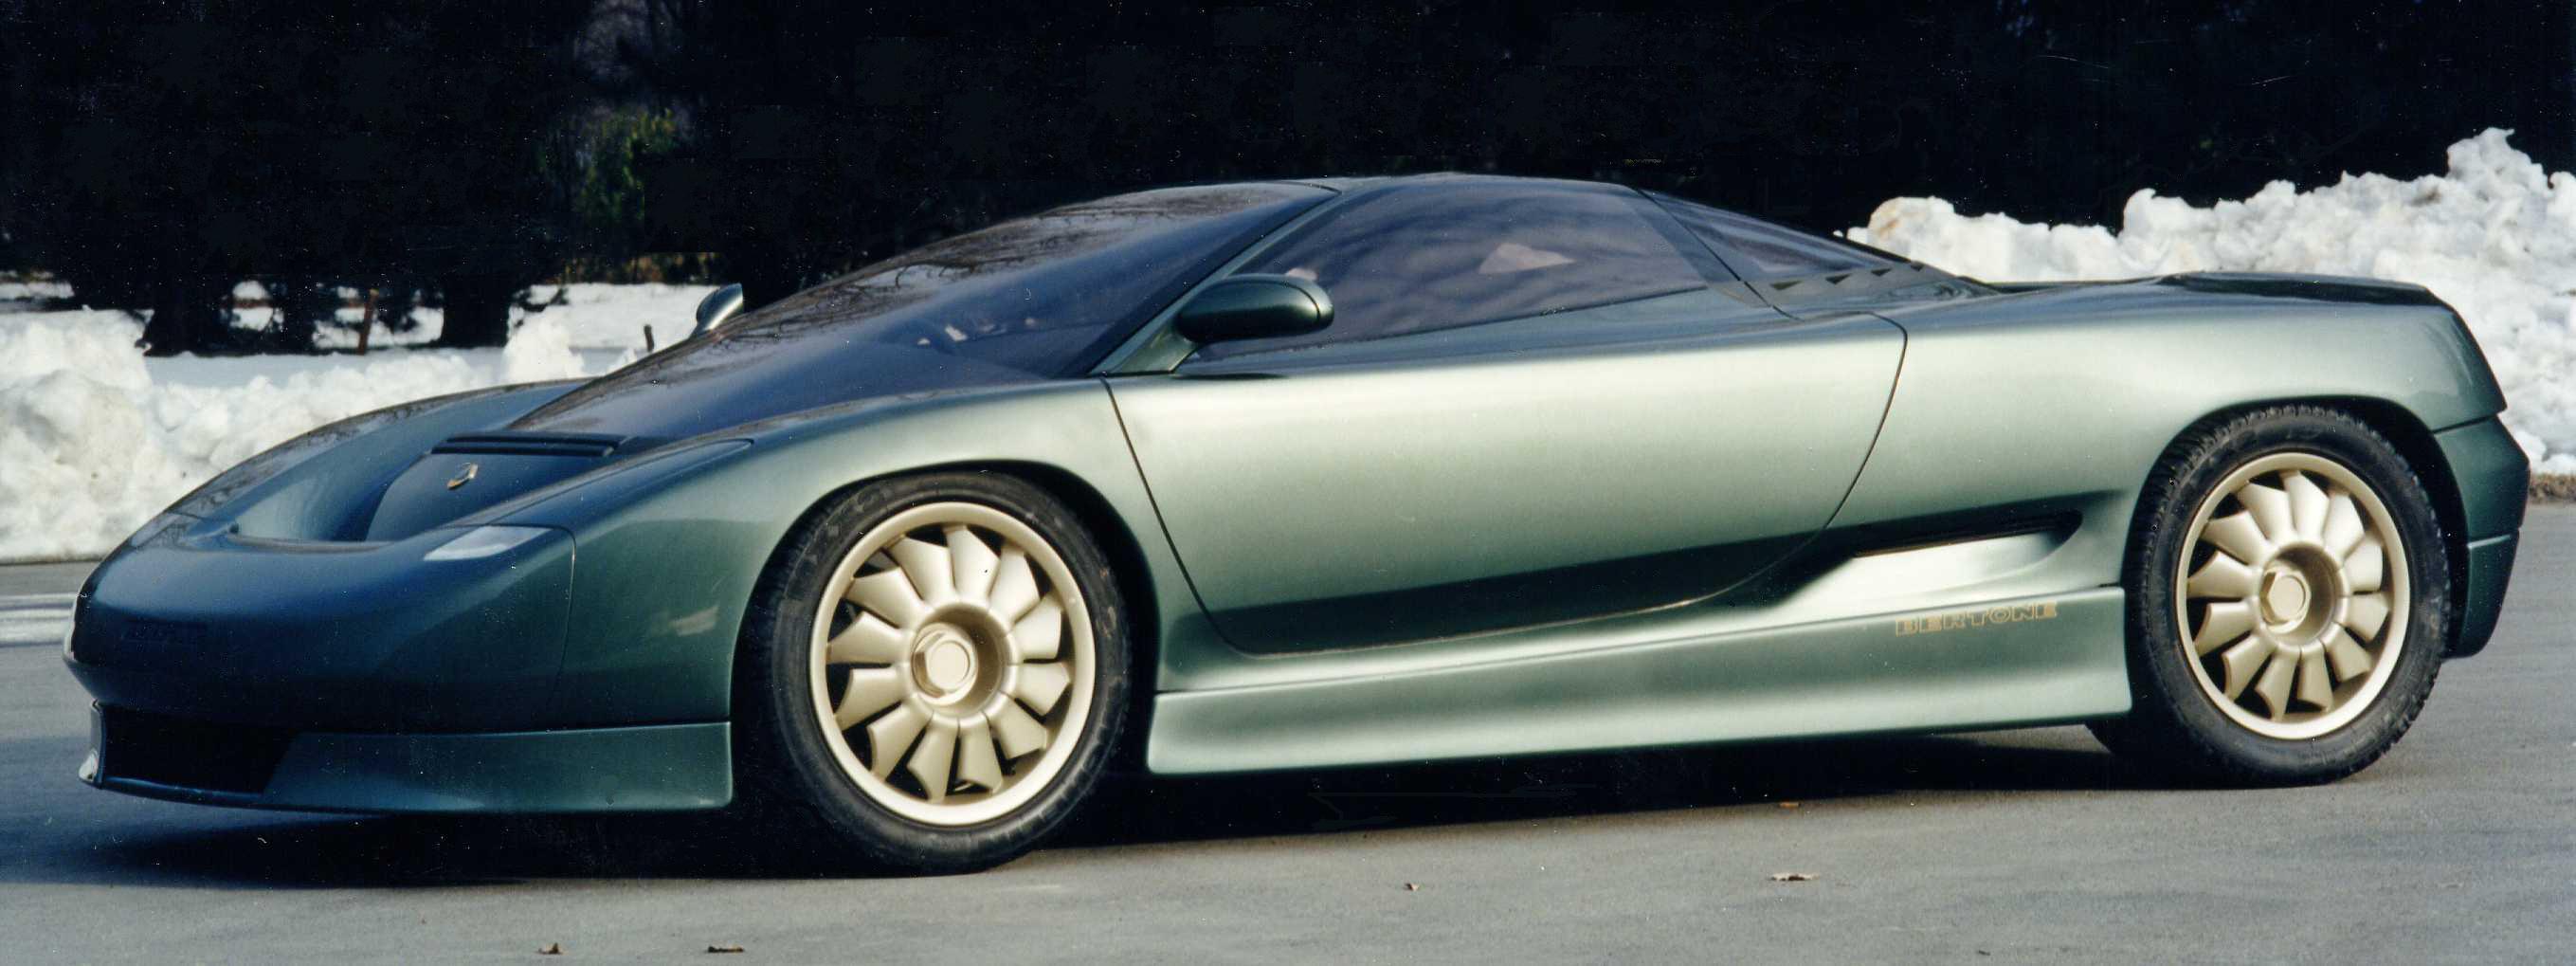 Lotus_Emotion_Bertone Remarkable Lotus Carlton Body Kit for Sale Cars Trend